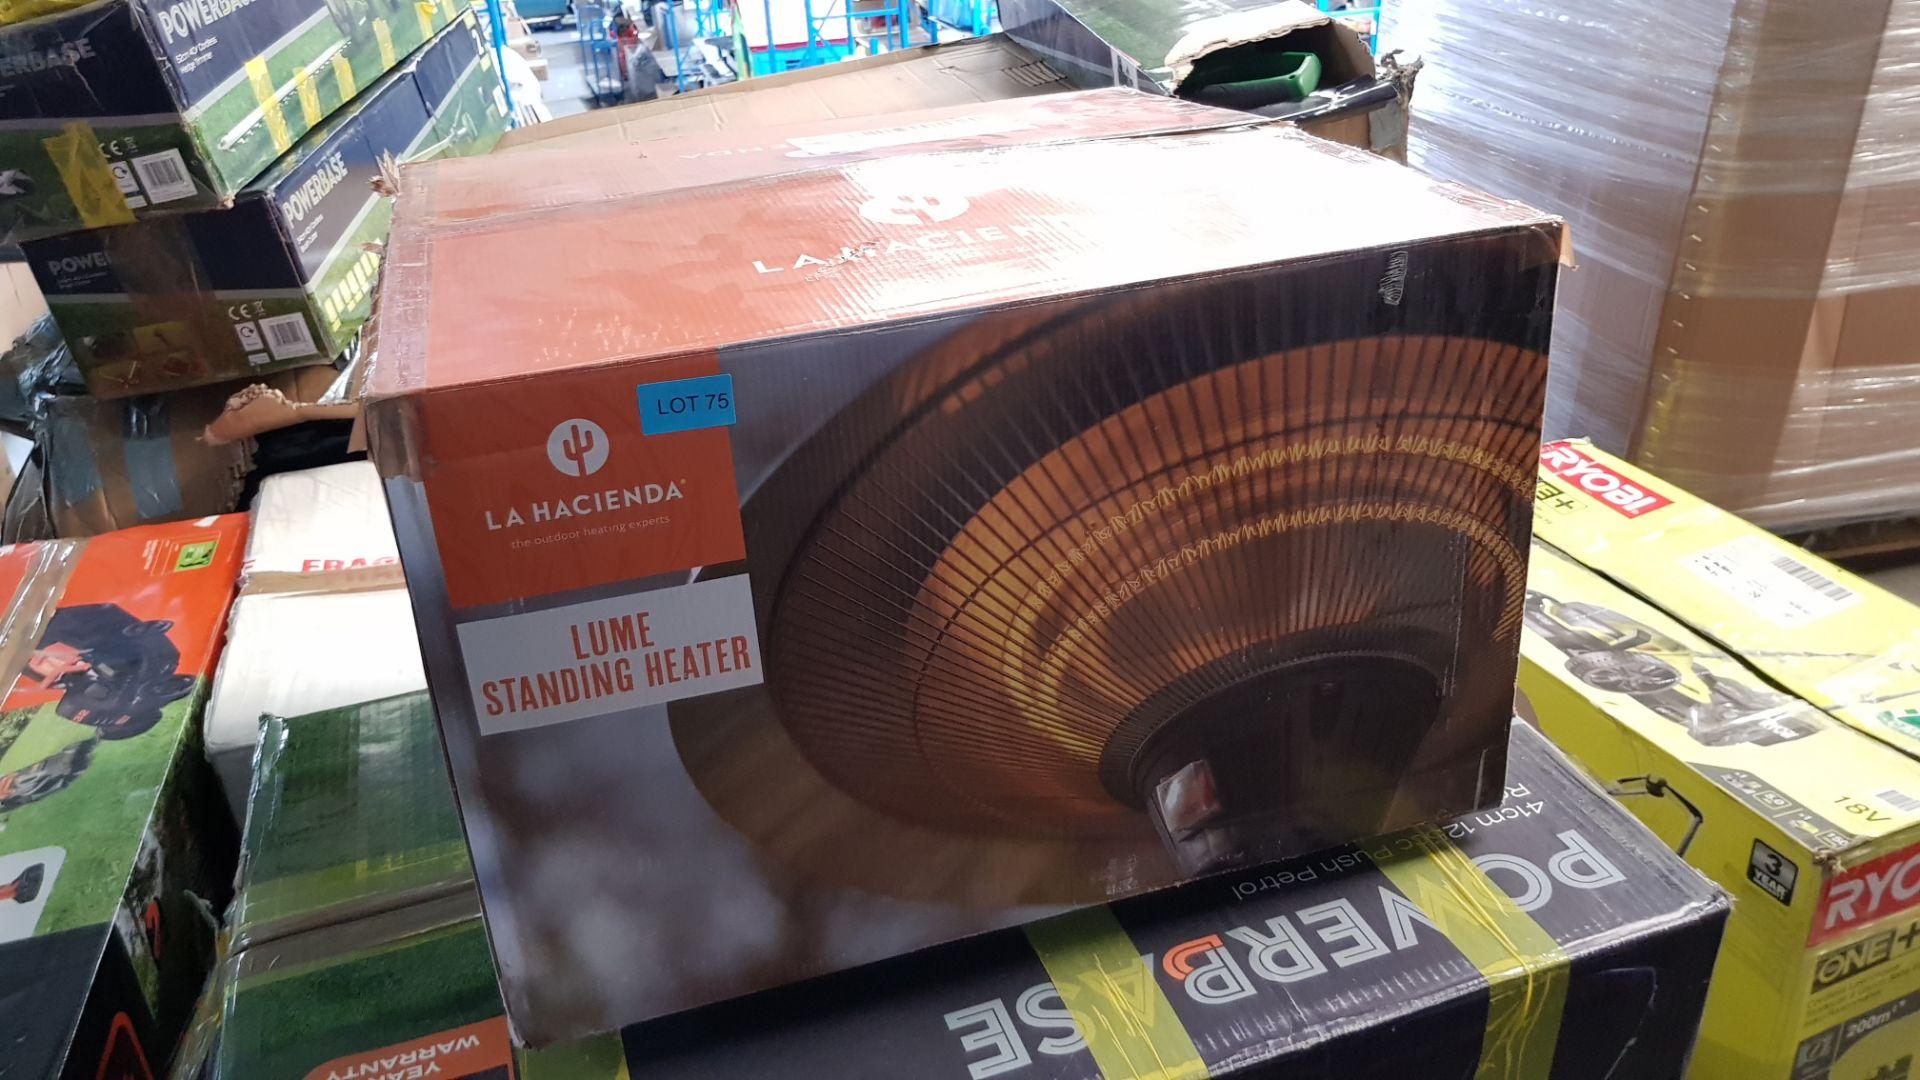 (P3) 1x La Hacienda Lume Standing Heater. (H205x D50x Base D40.5cm). Contents In Original Packaging - Image 2 of 3